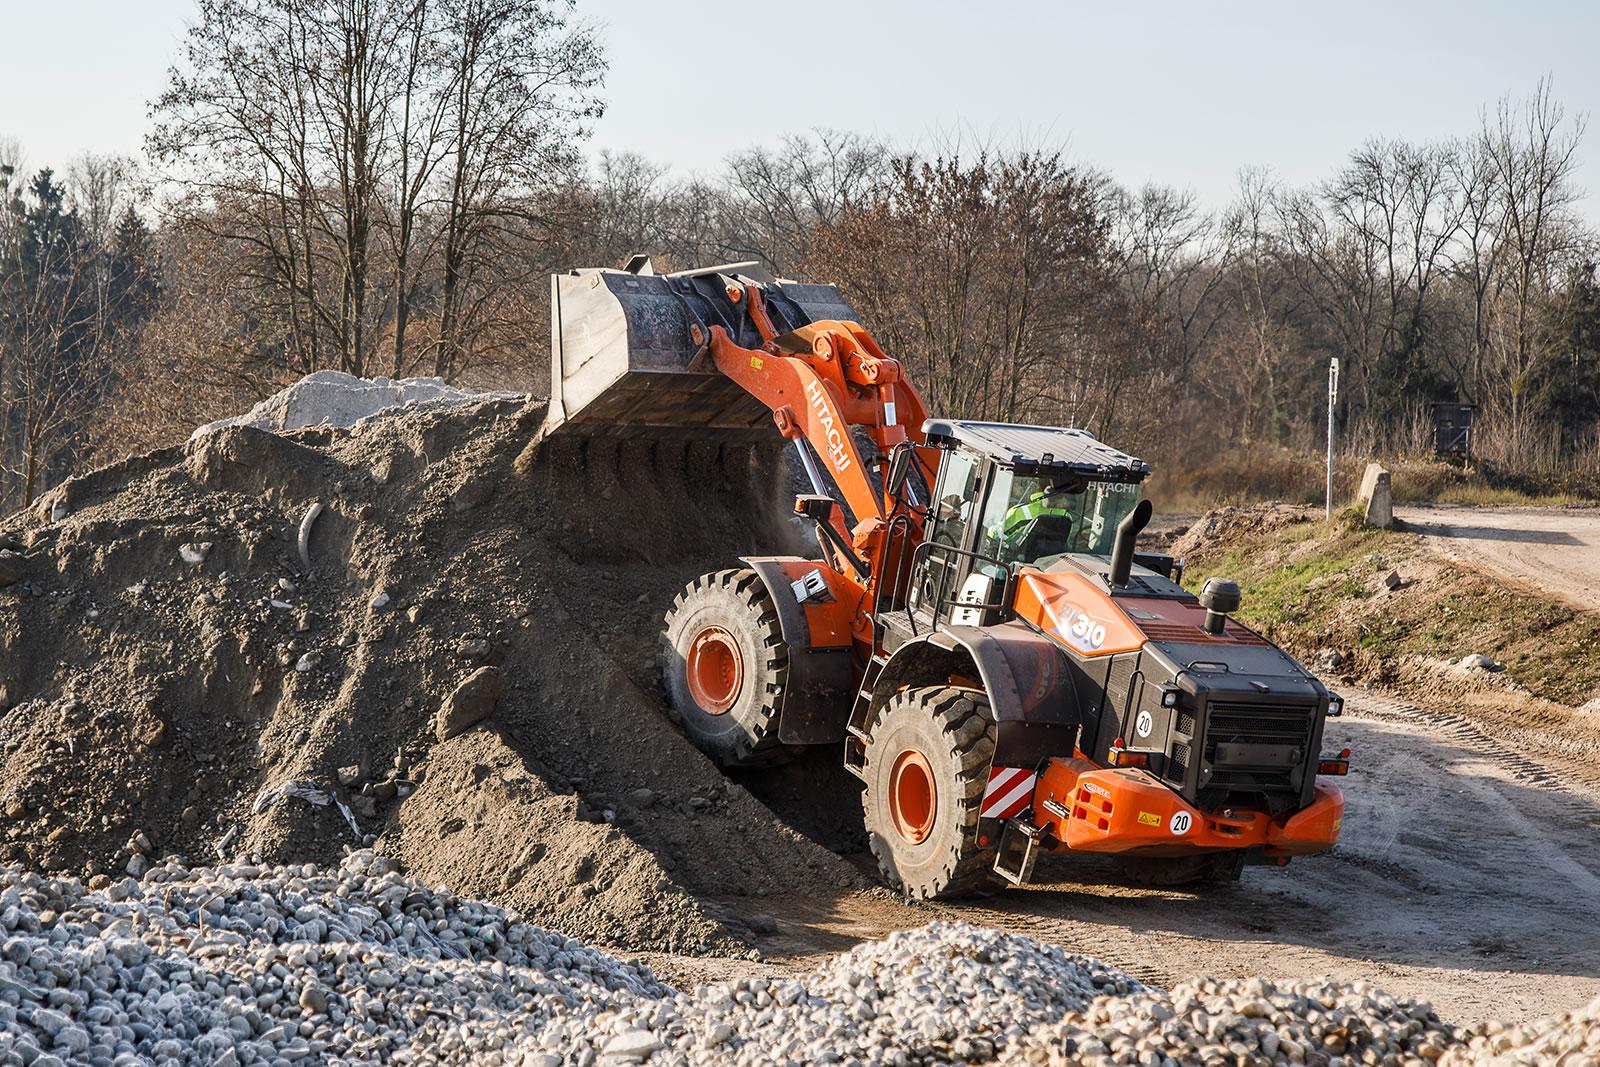 Hitachi ZW310-6 wheel loader dumps the materials for MinERALix